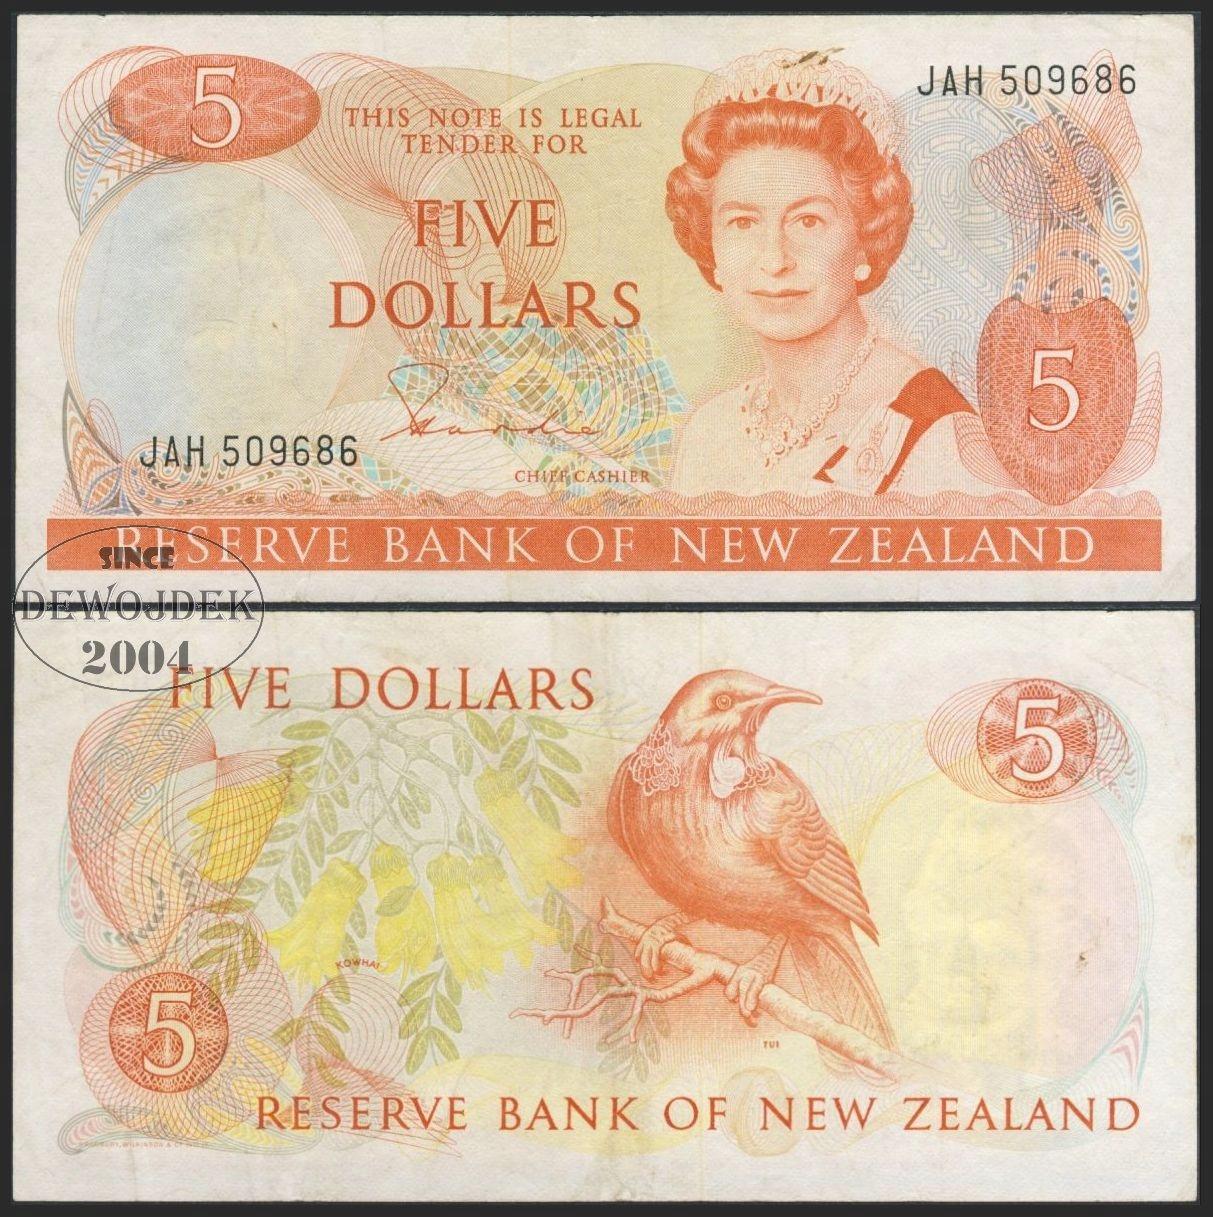 MAX - NOWA ZELANDIA 5 Dollars 1981 r # P171a # VF-